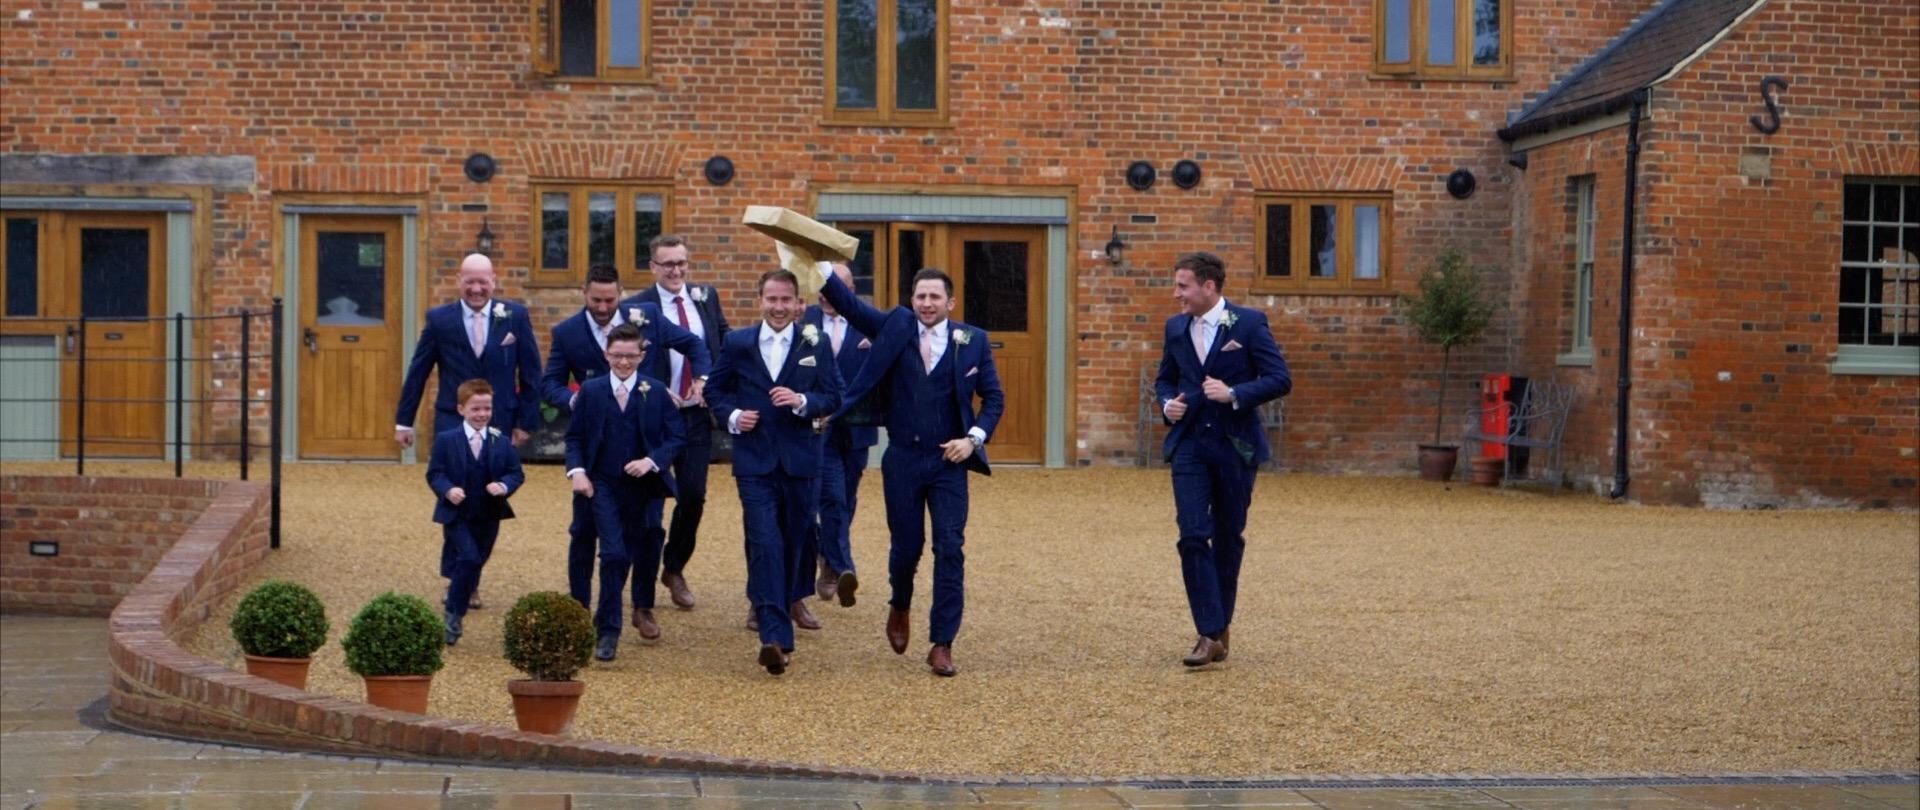 Running in the Rain at Apton Hall weddings Videogapher.jpg